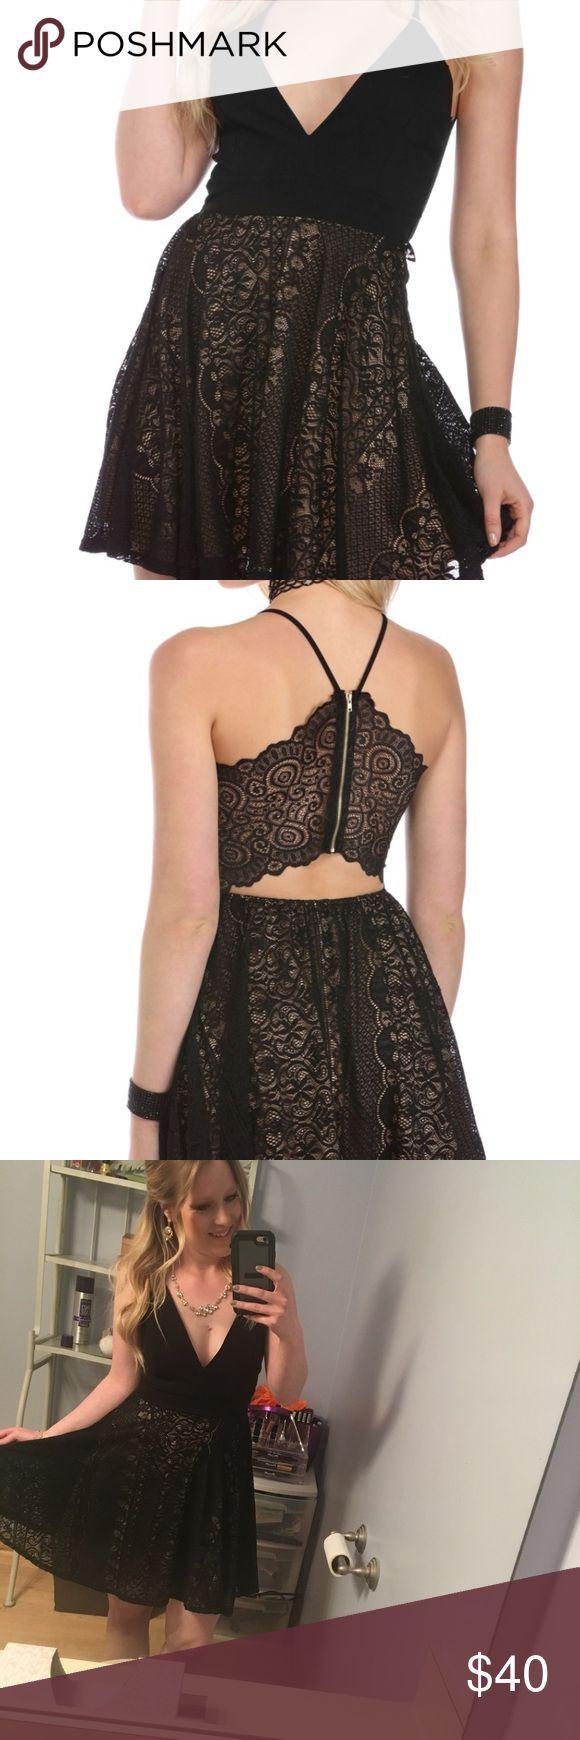 Windsor Dress Worn for a few hours only., Windsor Dresses